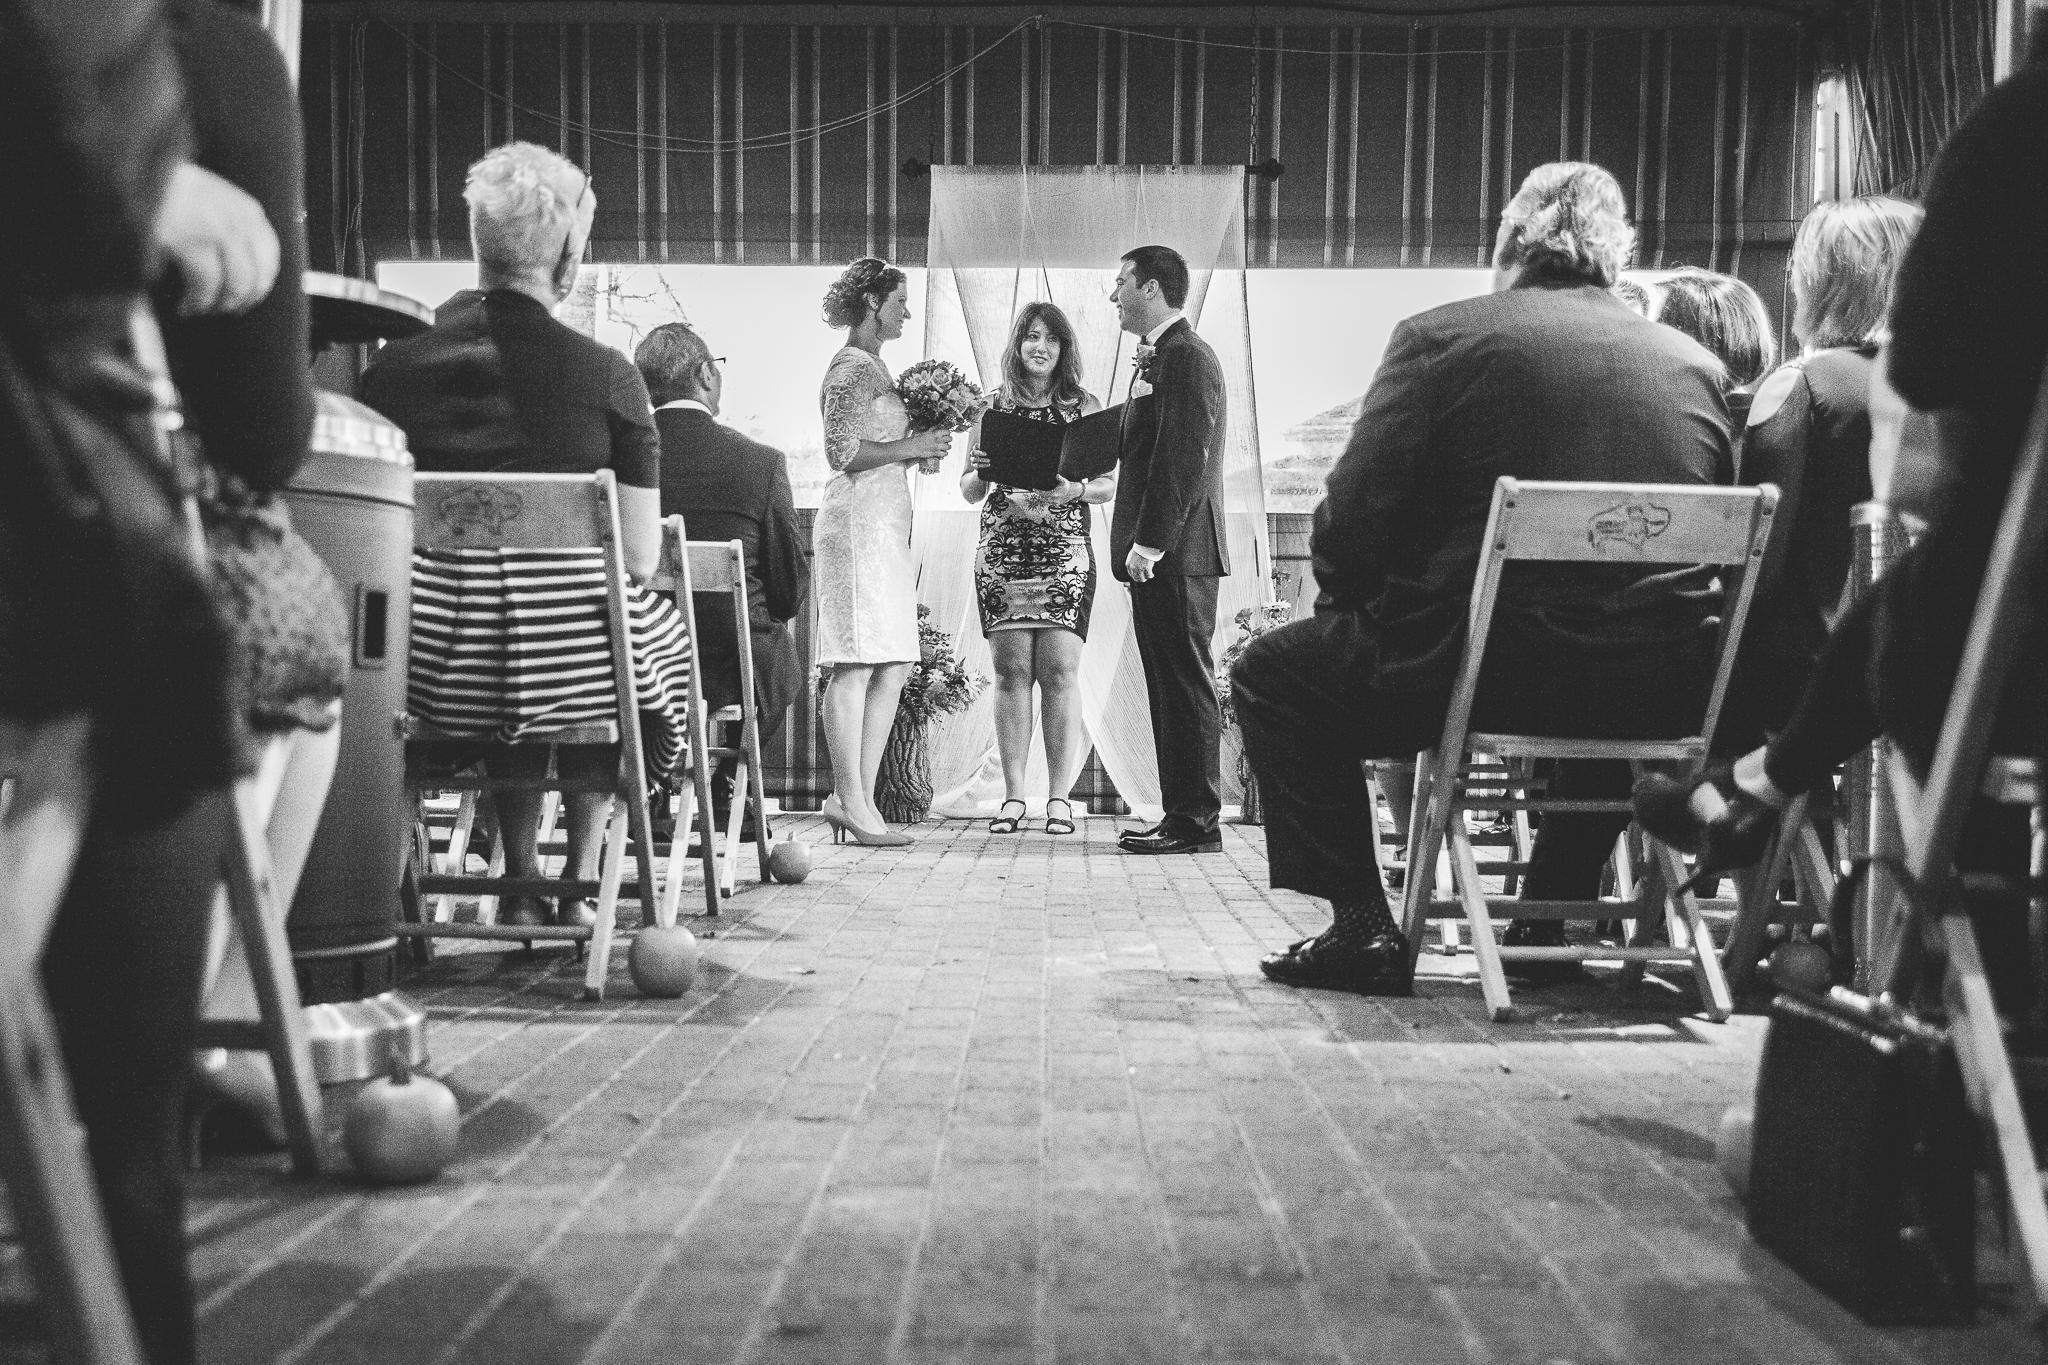 camuglia-whomstudio-chelsea_and_andy-nycphotographer-wedding-brooklyn-buffalo-timberlodge-074-0573.jpg